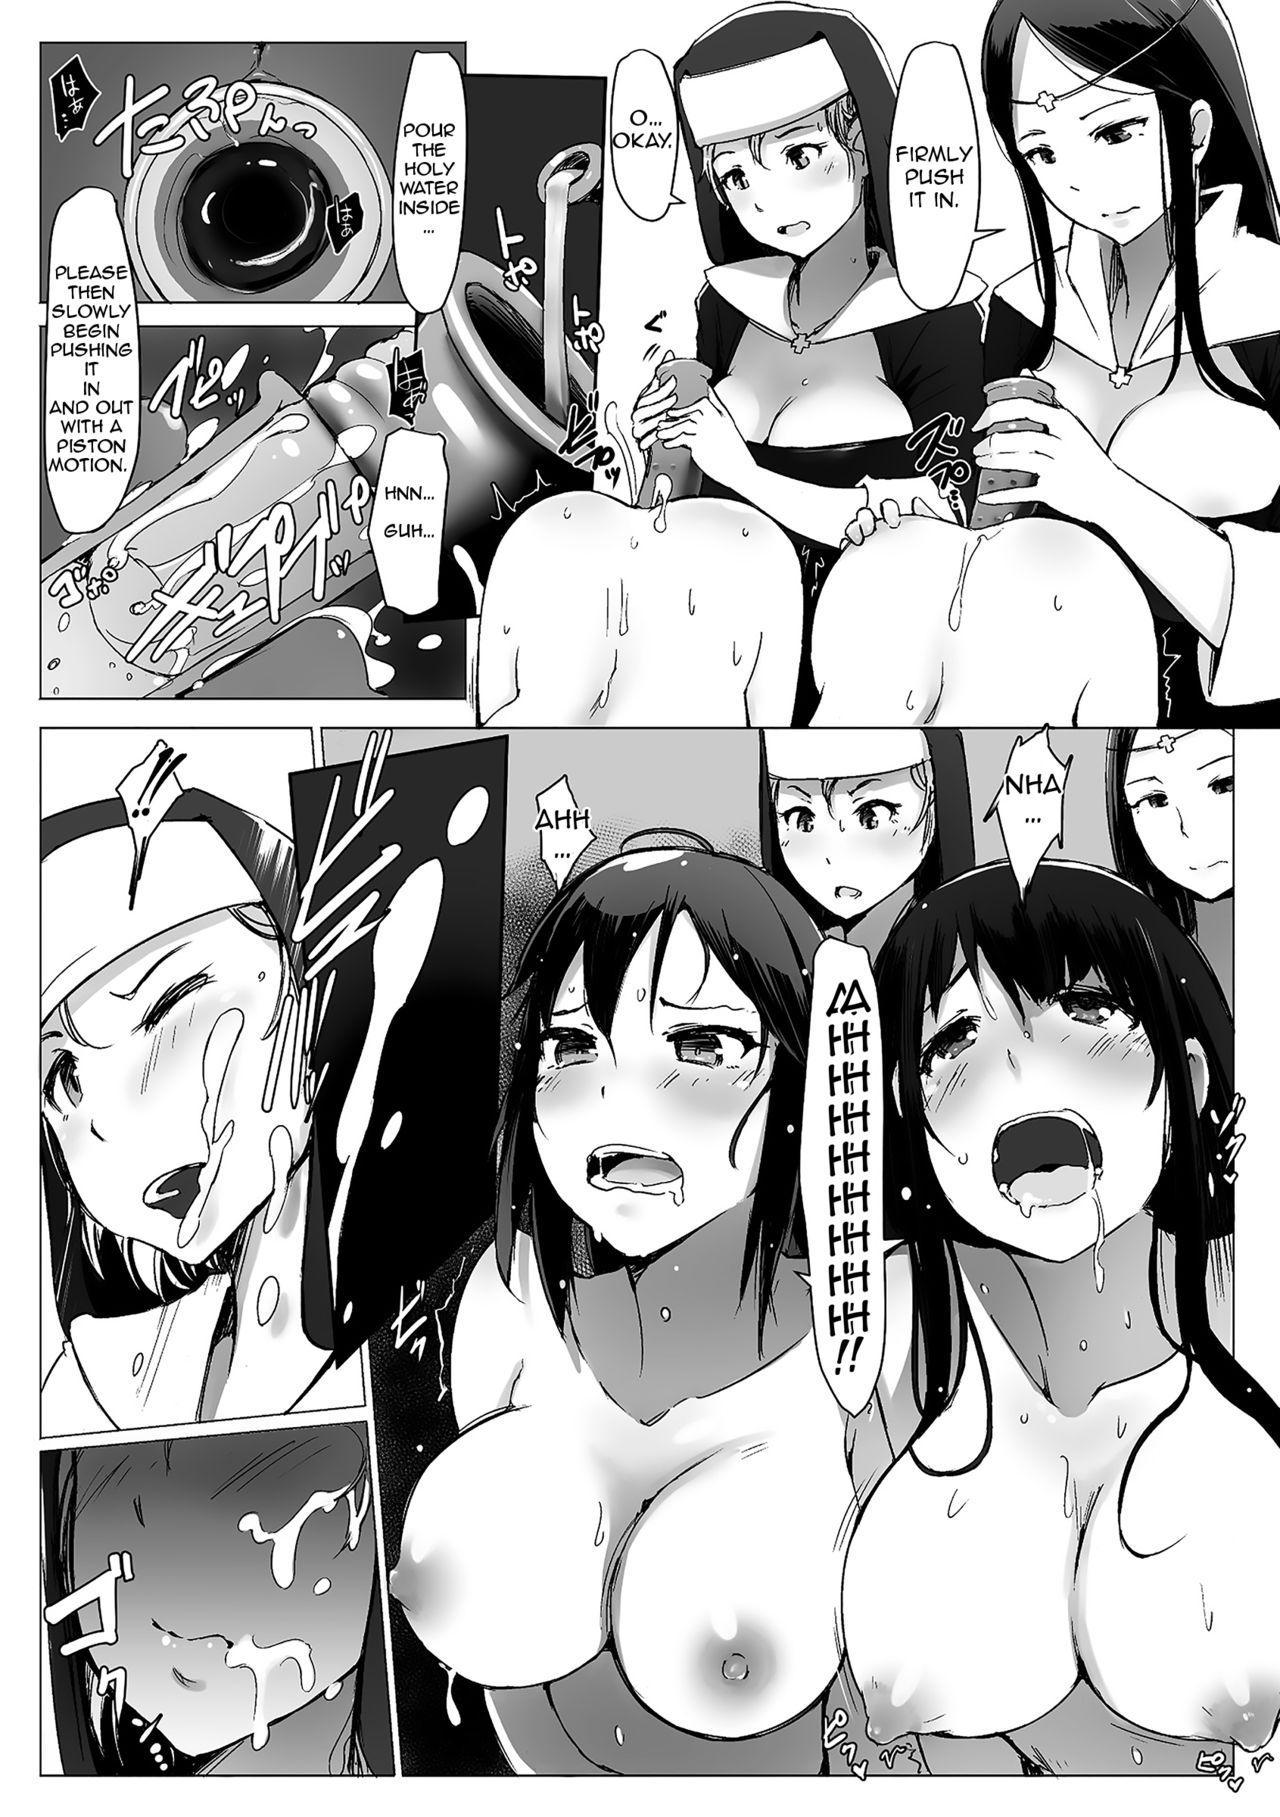 Yamaneko Kishidan Monogatari Onna Kishi Irina Dainiwa | The Tale of the Wildcat Chivalric Order's Knight Irina, Second Story 7